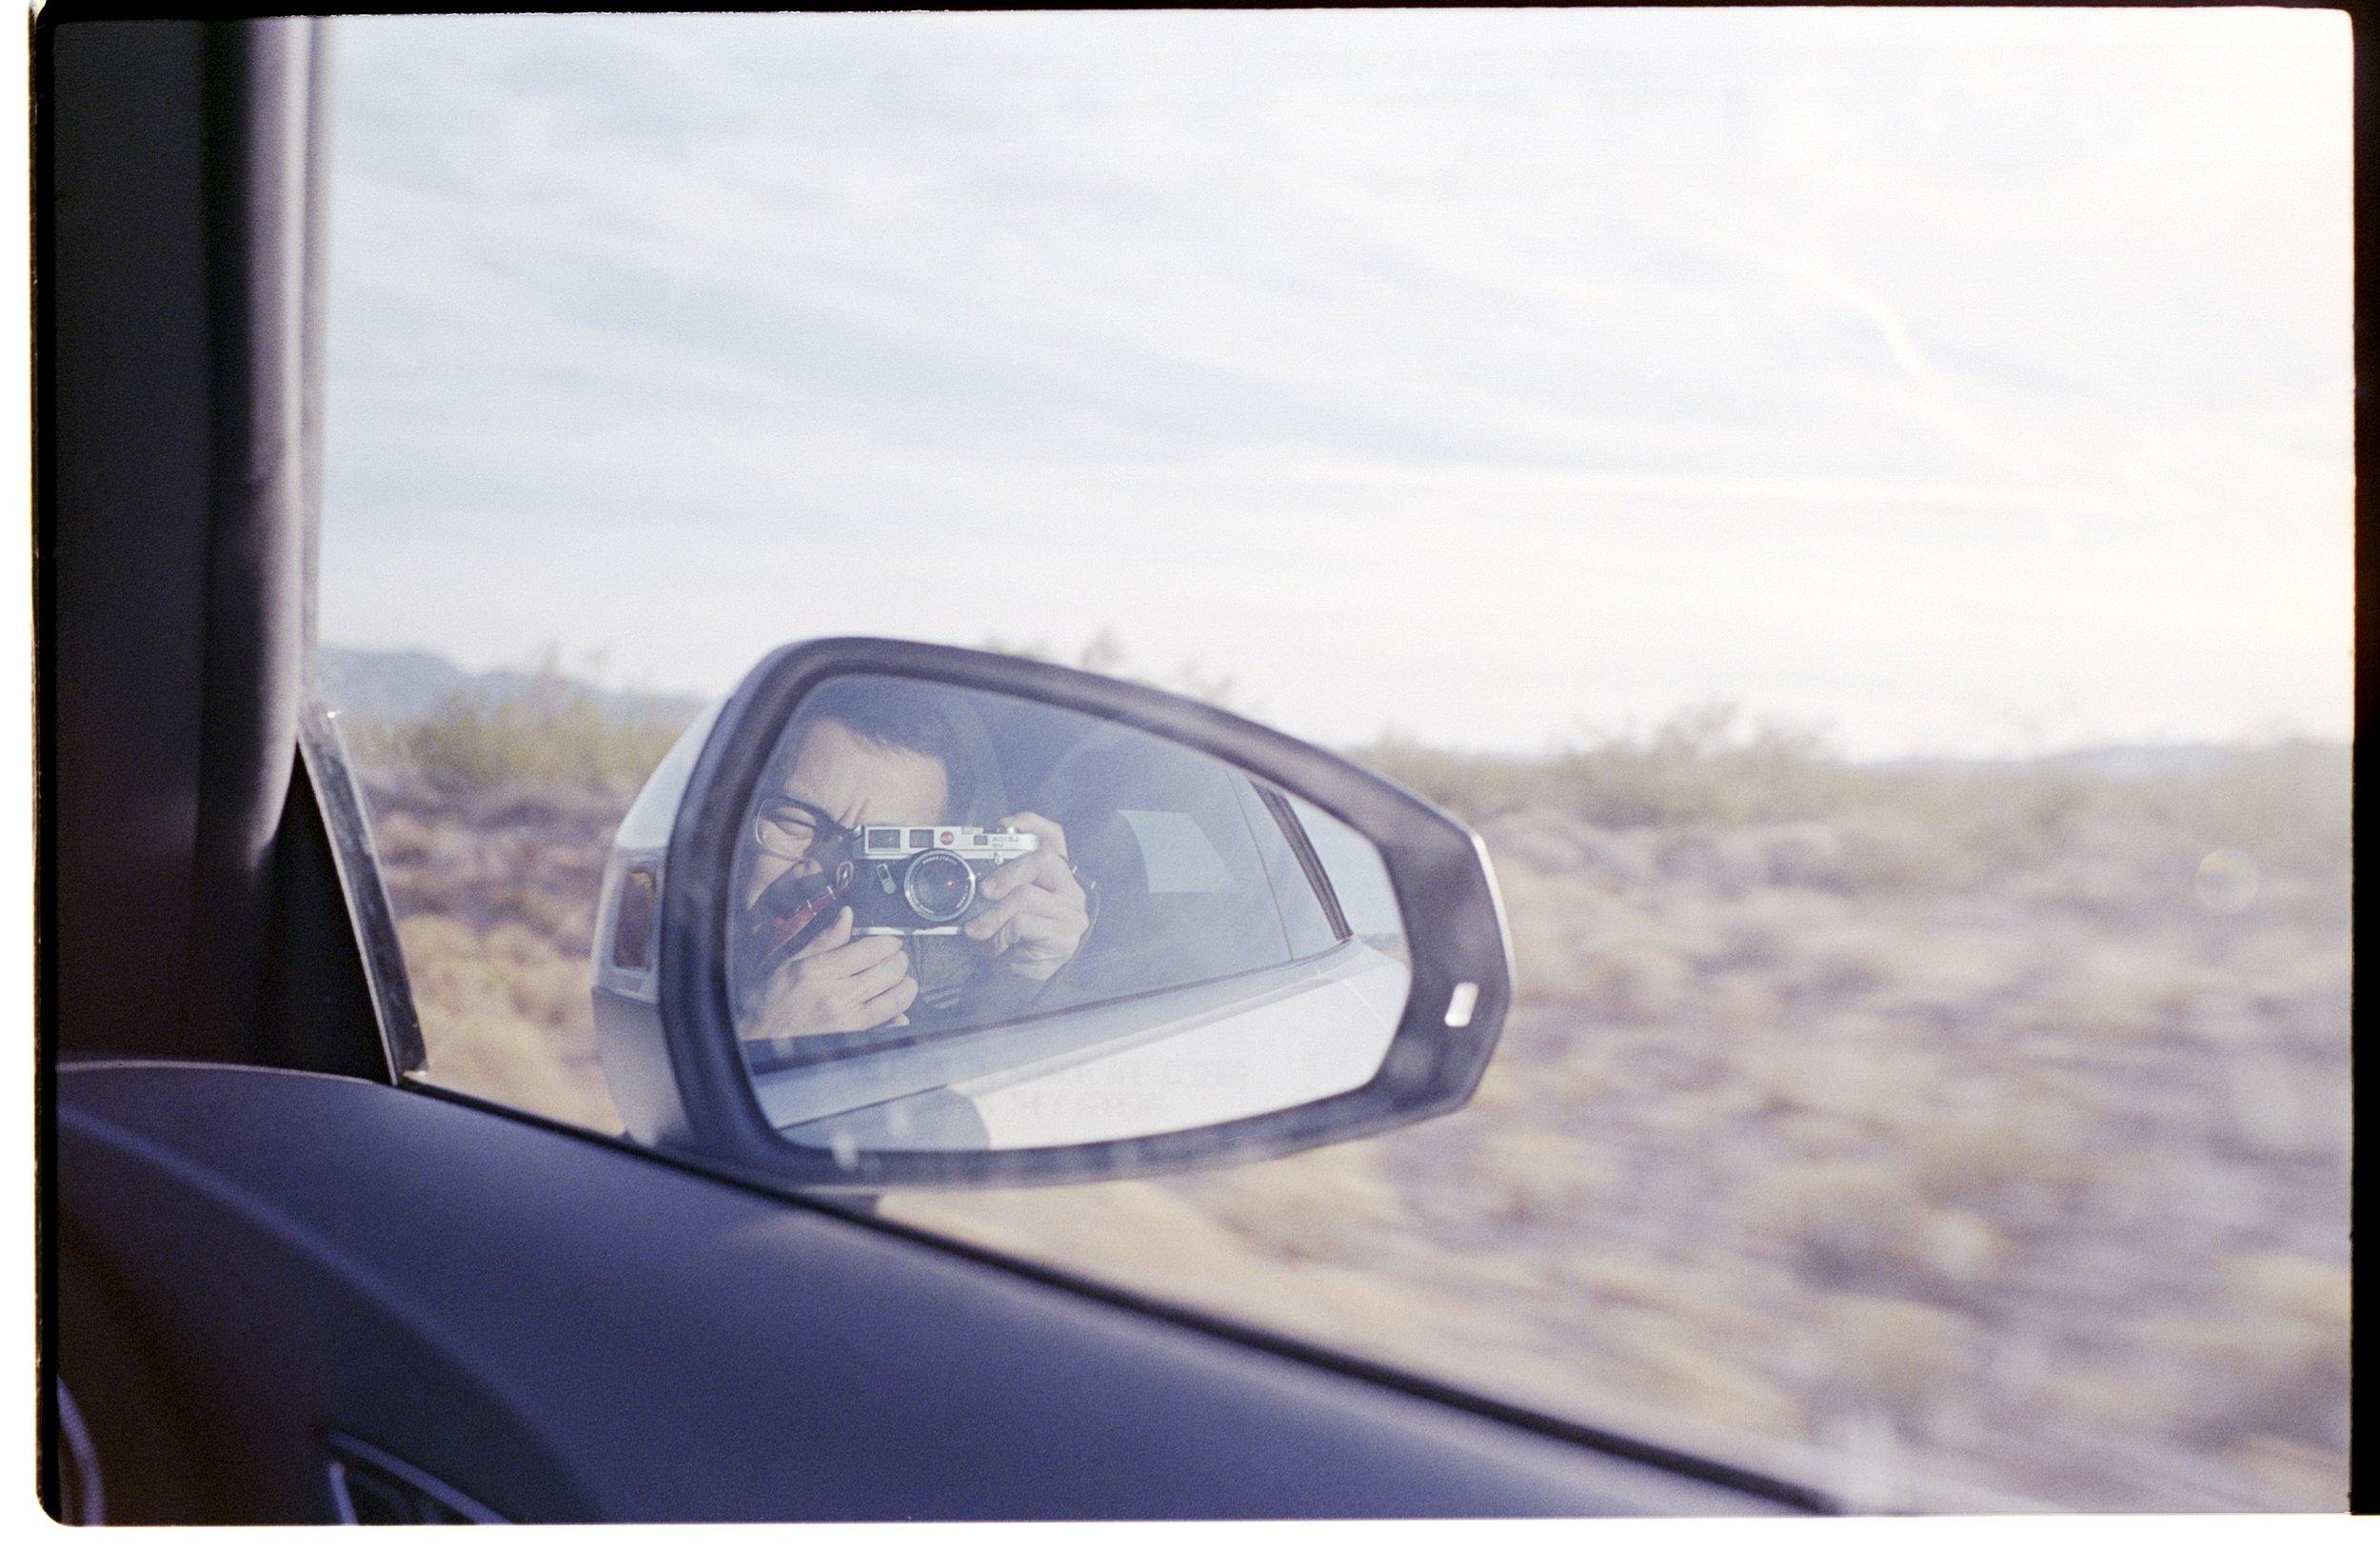 Dessert selfies in Nevada